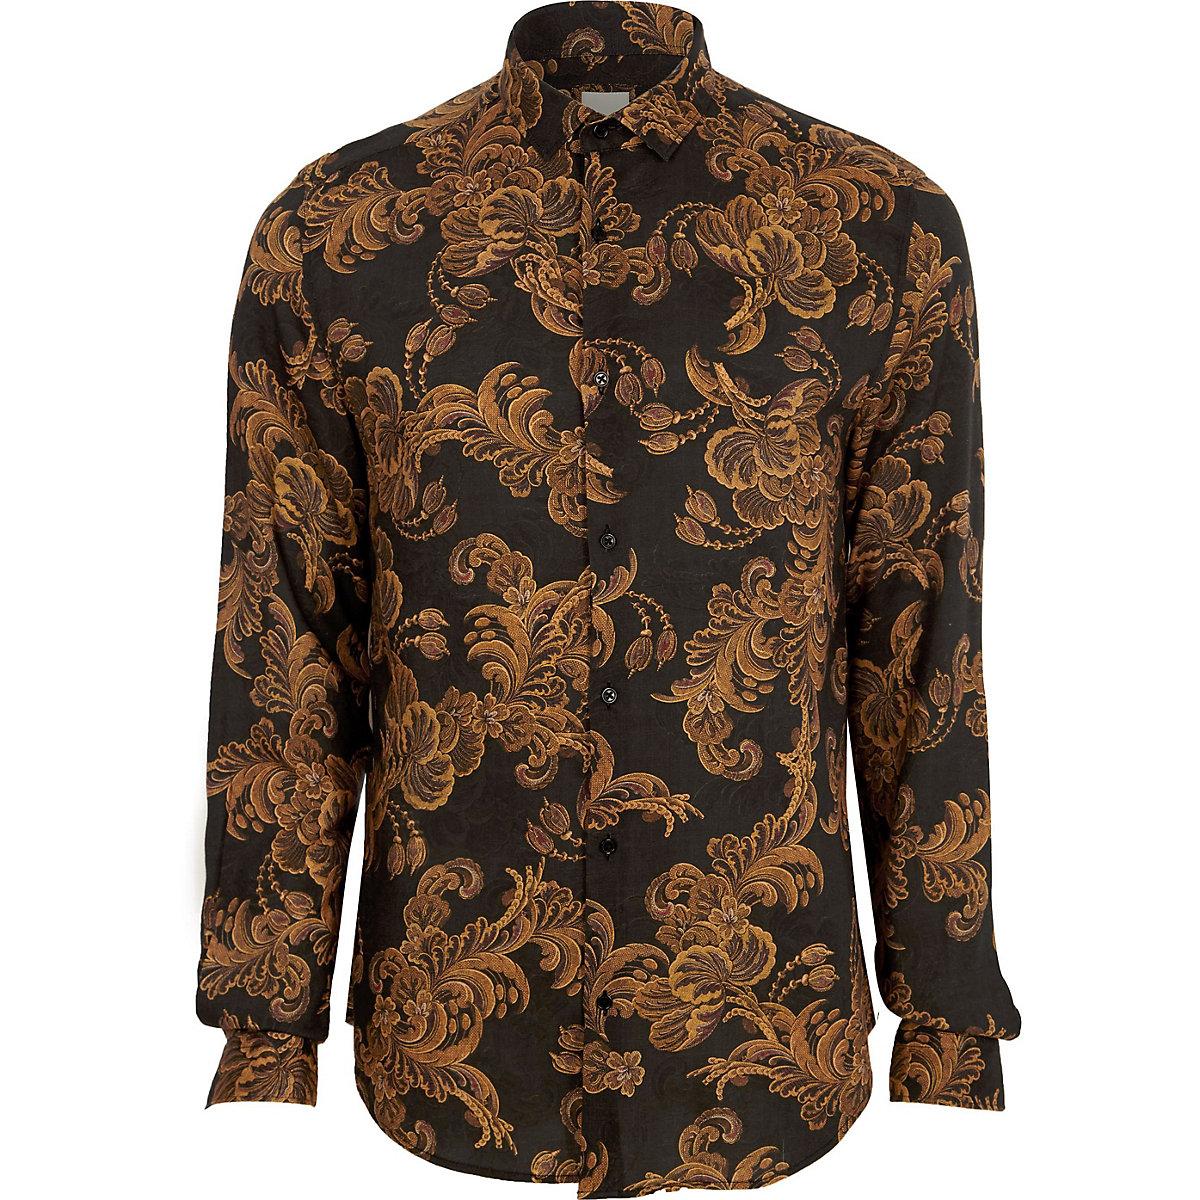 Big and Tall black baroque long sleeve shirt